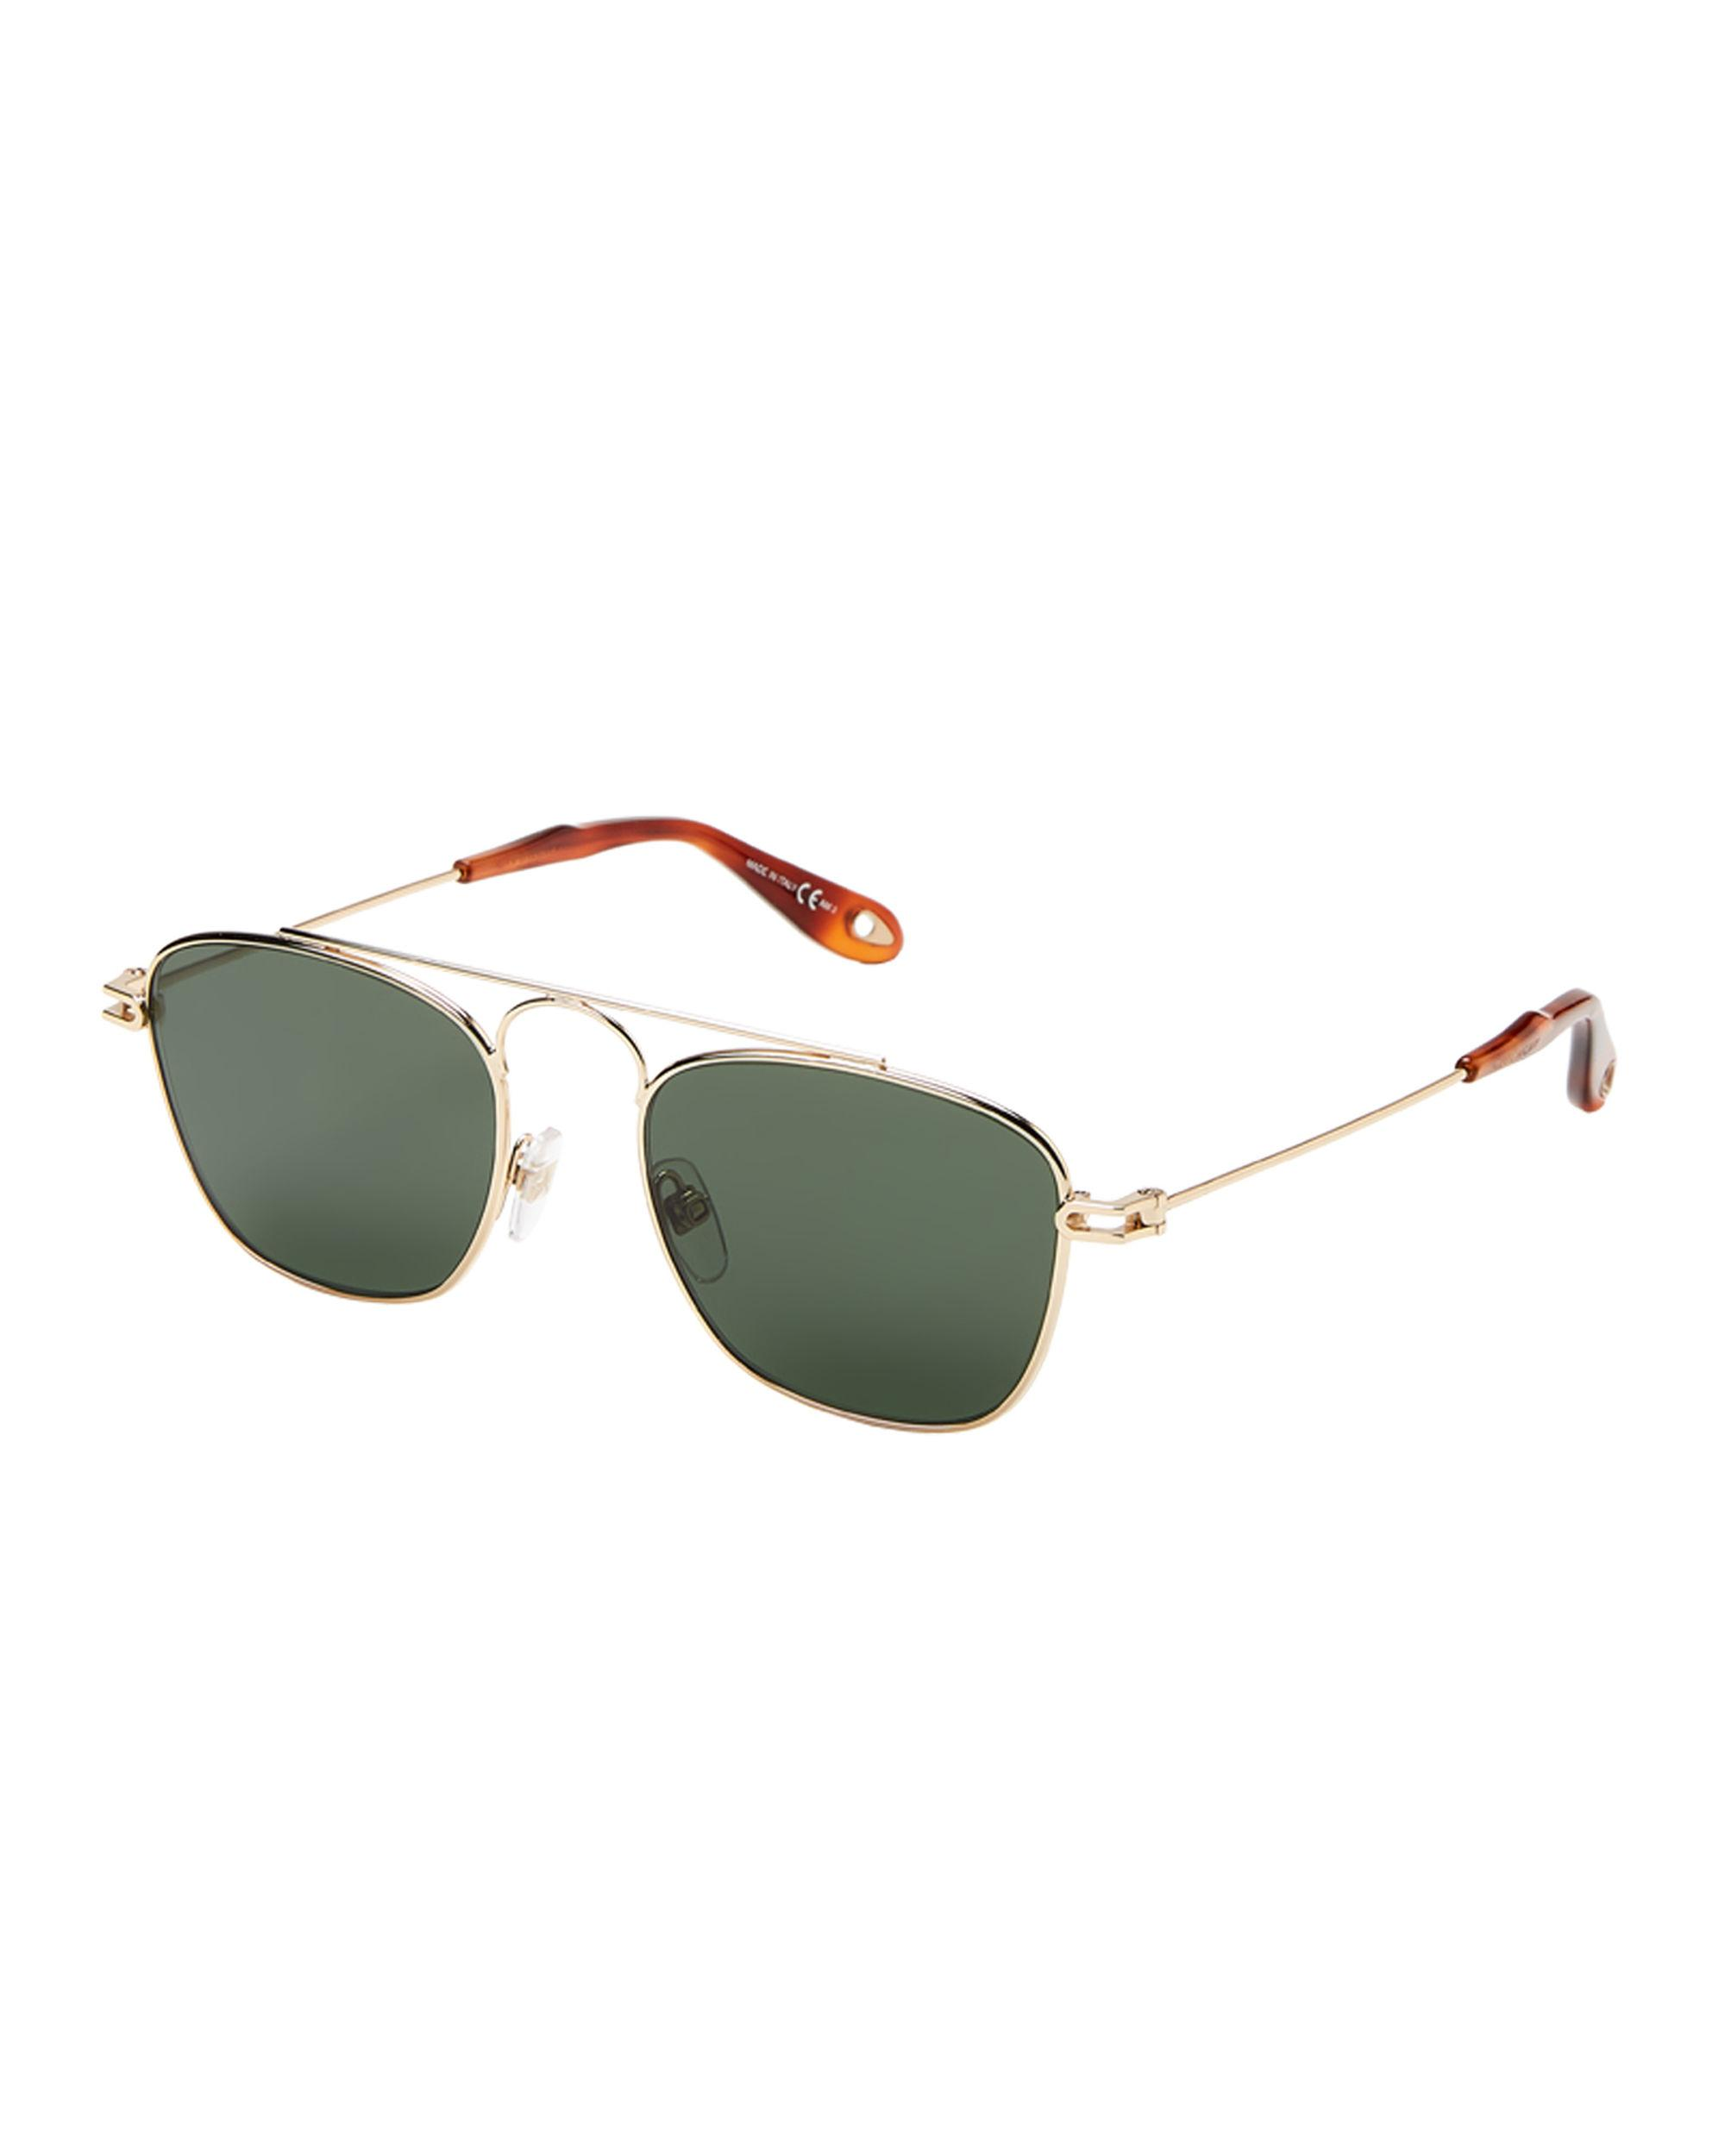 b225b20ac Givenchy Gv7055/s Gold-tone Square Aviator Sunglasses for Men - Lyst